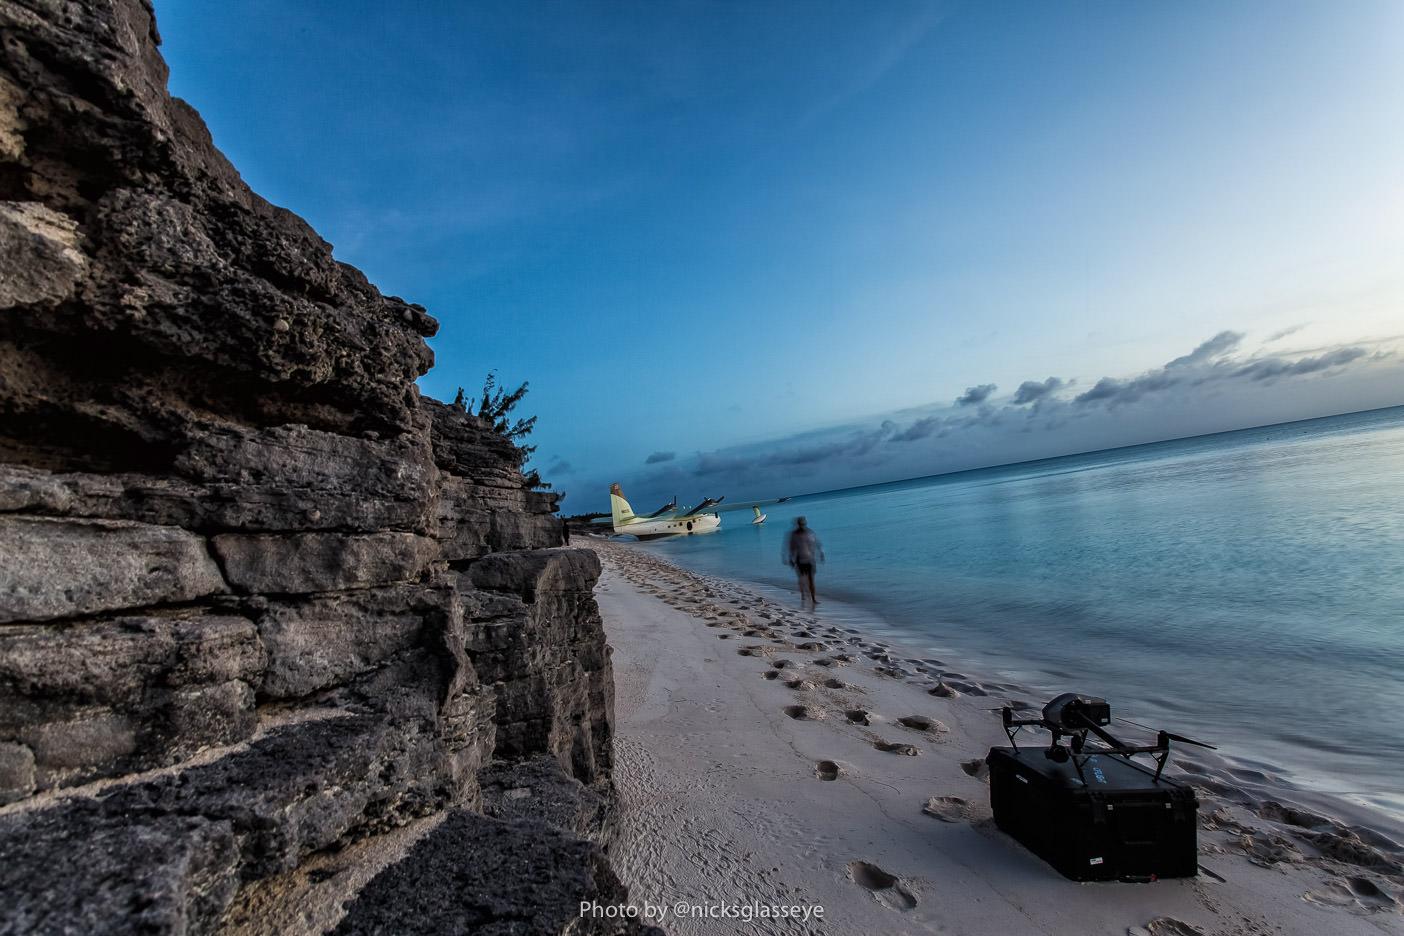 Flying Boat Bahamas BTS, Photo Credit: Nicholas Pascarella @nicksglasseye